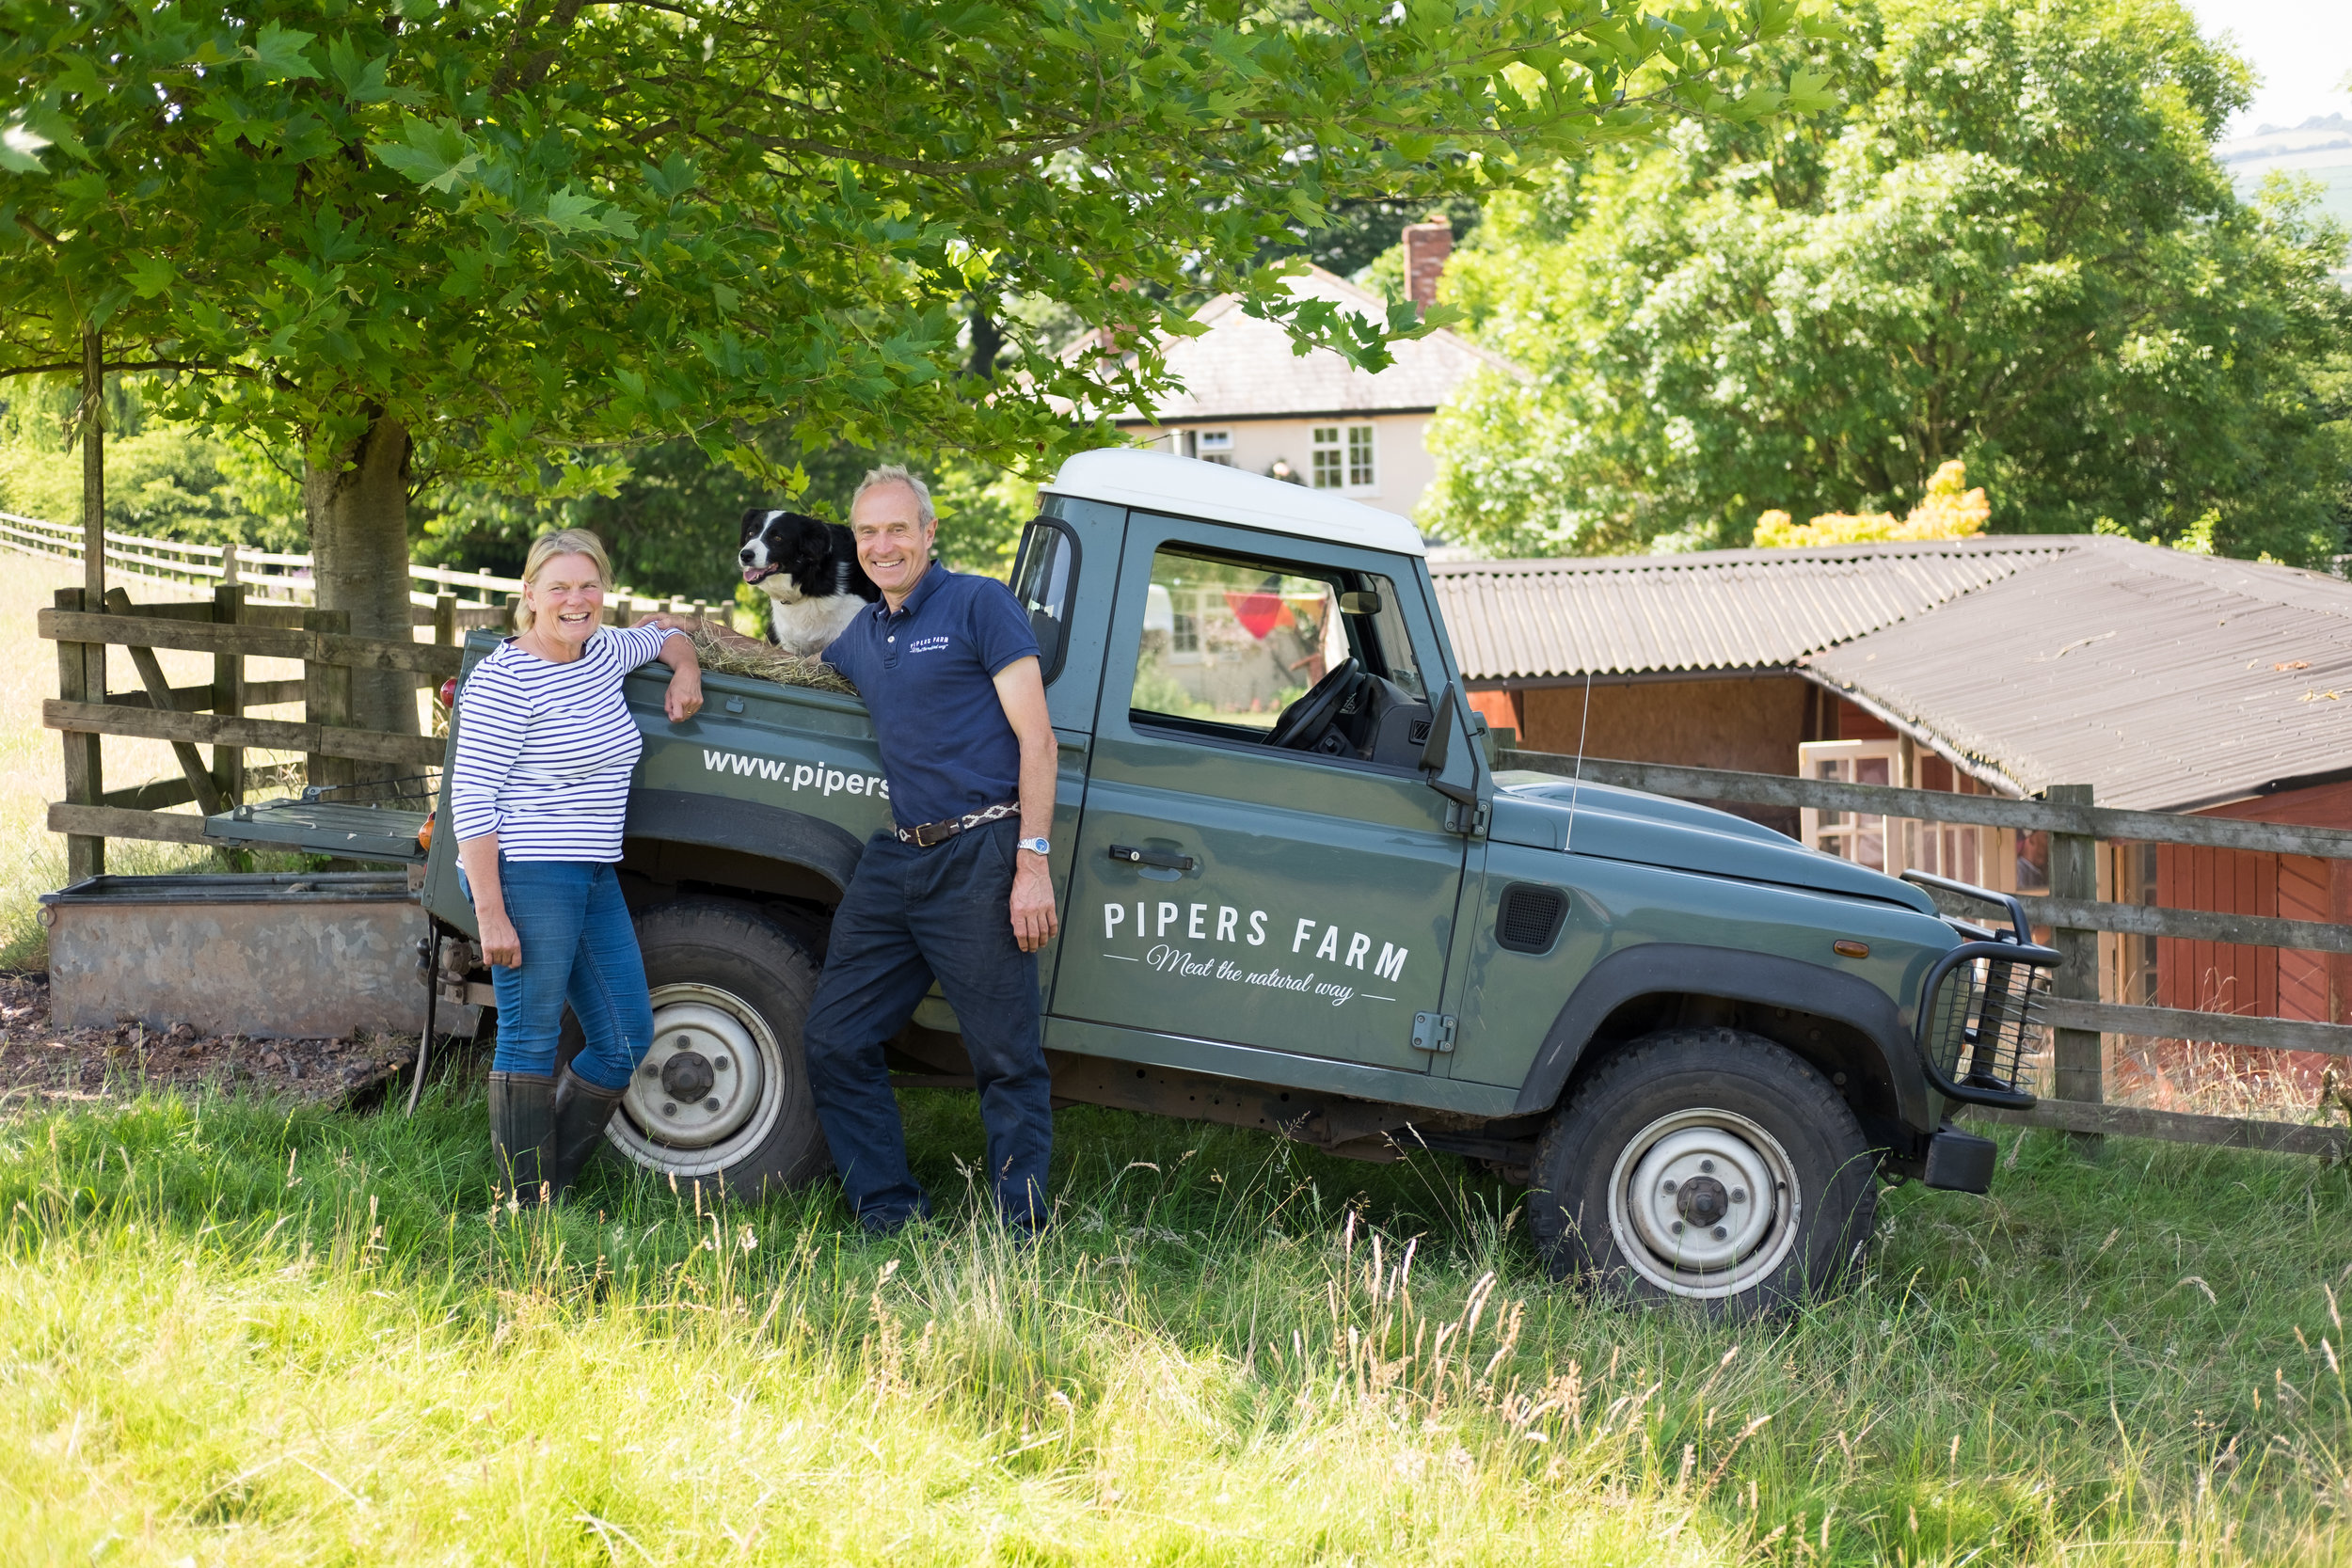 henri_peter_grieg_pipers_farm